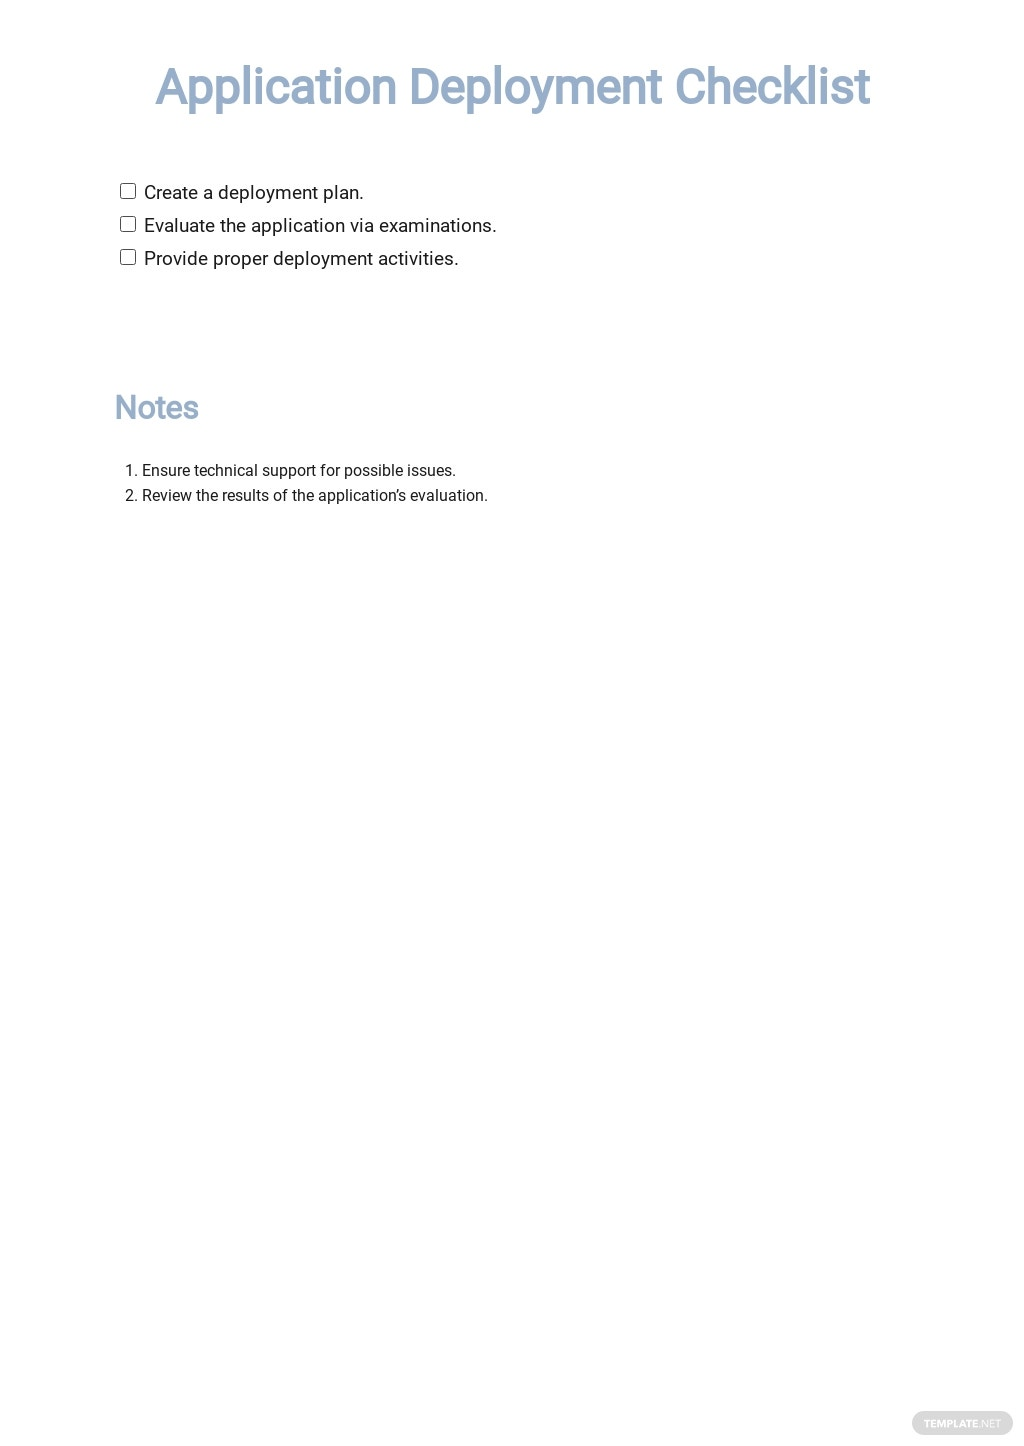 Application Deployment Checklist Template